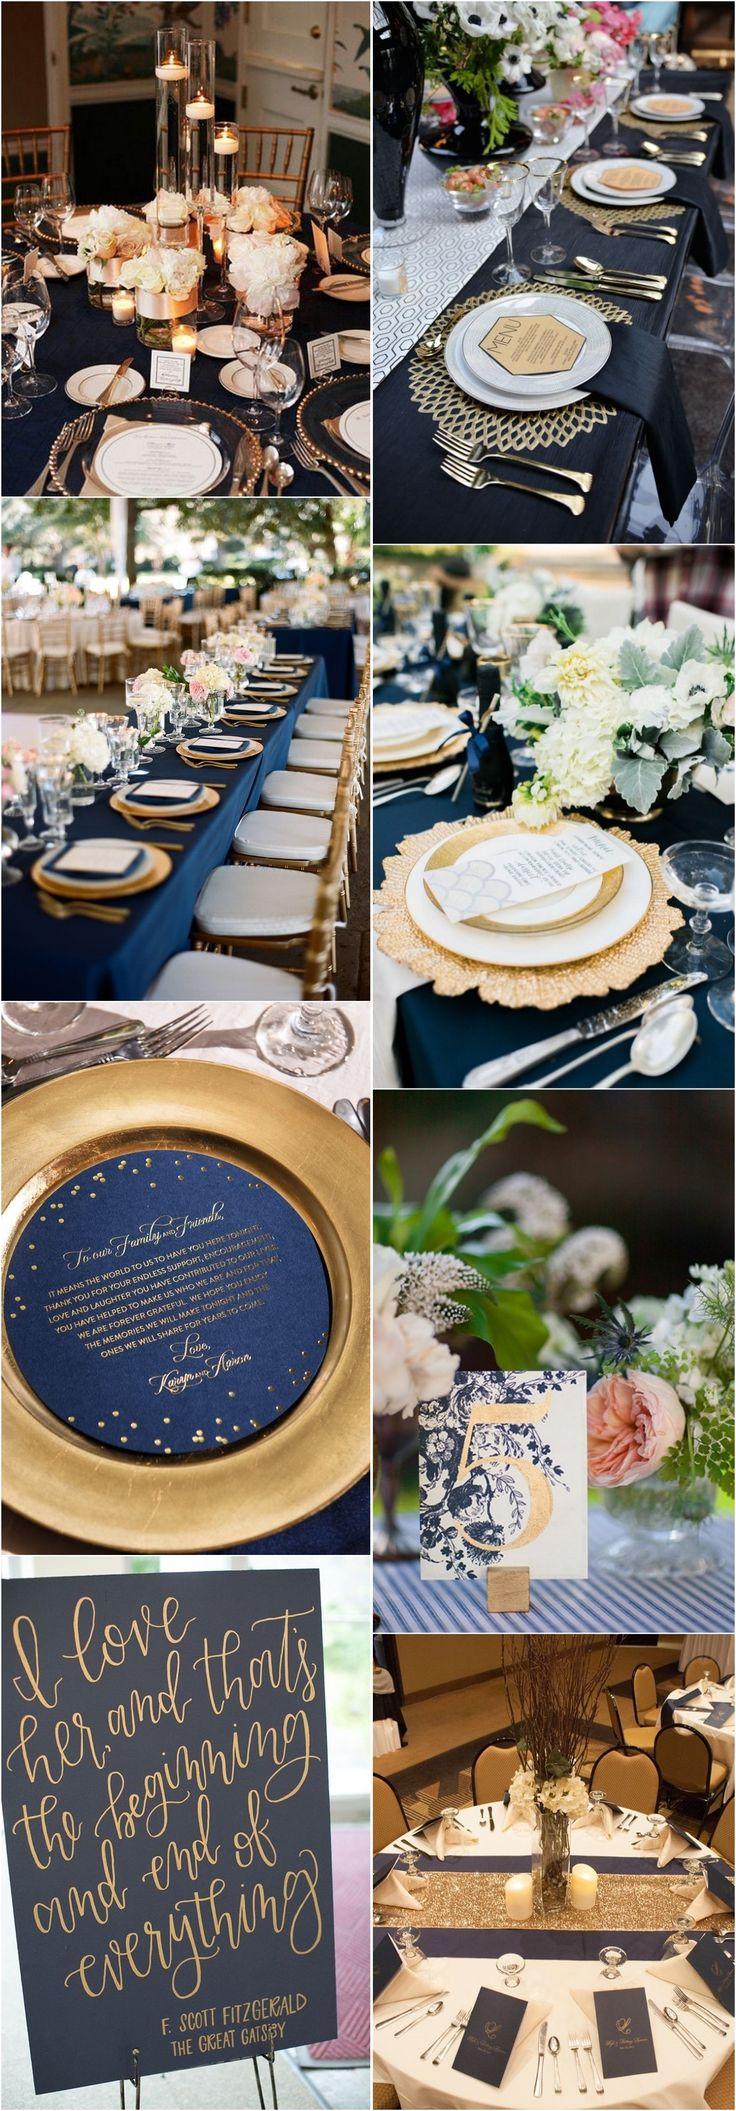 Outside fall wedding decorations february 2019  best Wedding  images by Ray Jack on Pinterest  Wedding